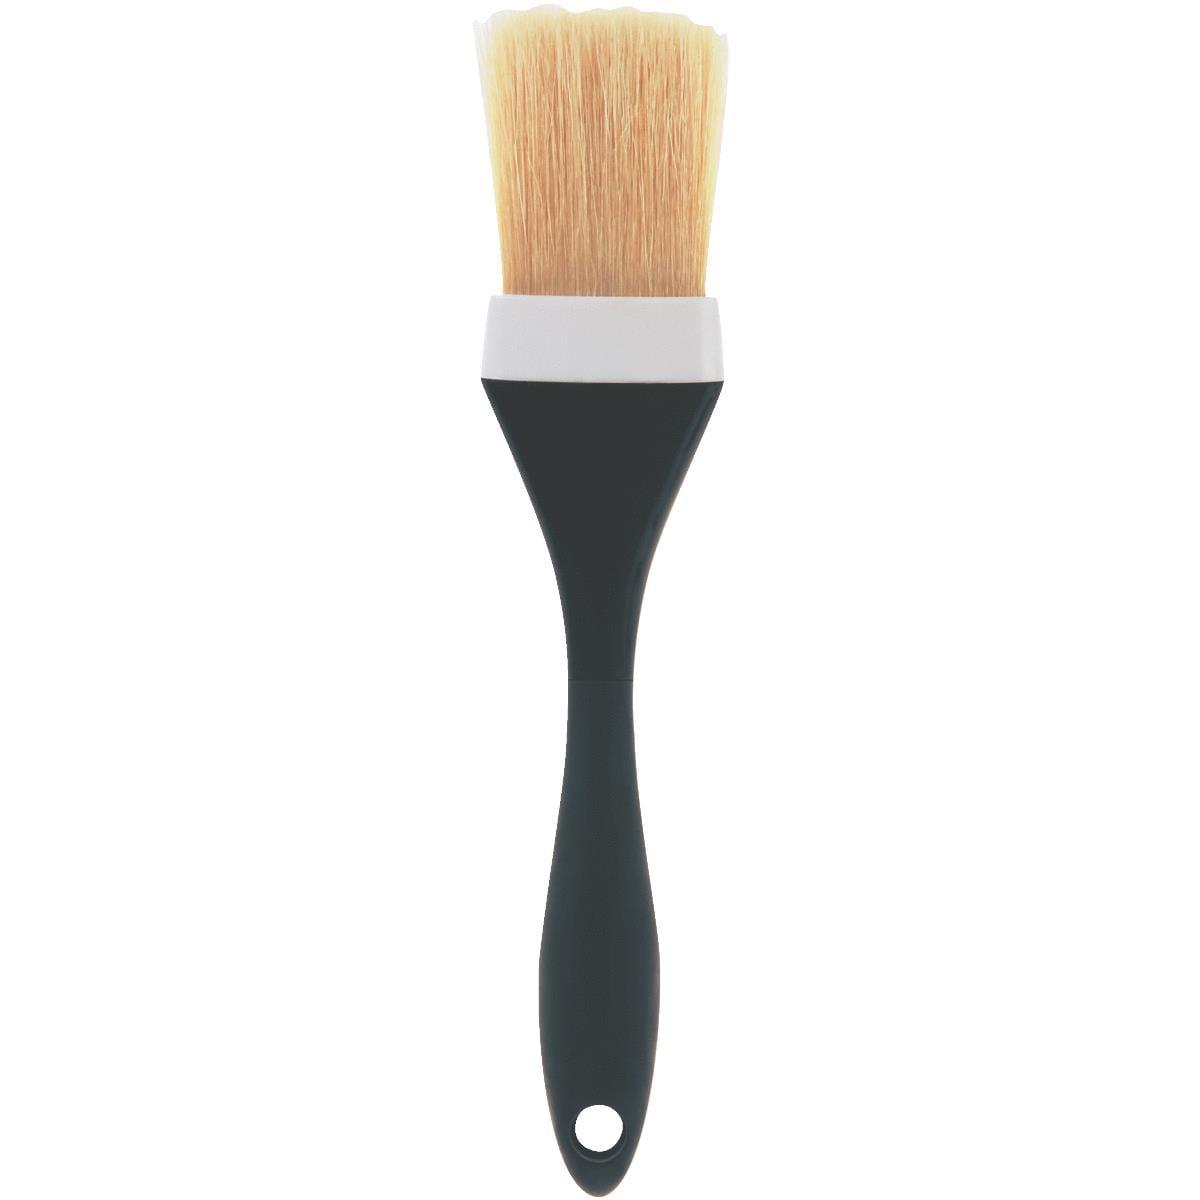 "Oxo International 6 Packs Oxo 1.5"" Pastry Brush by OXO"